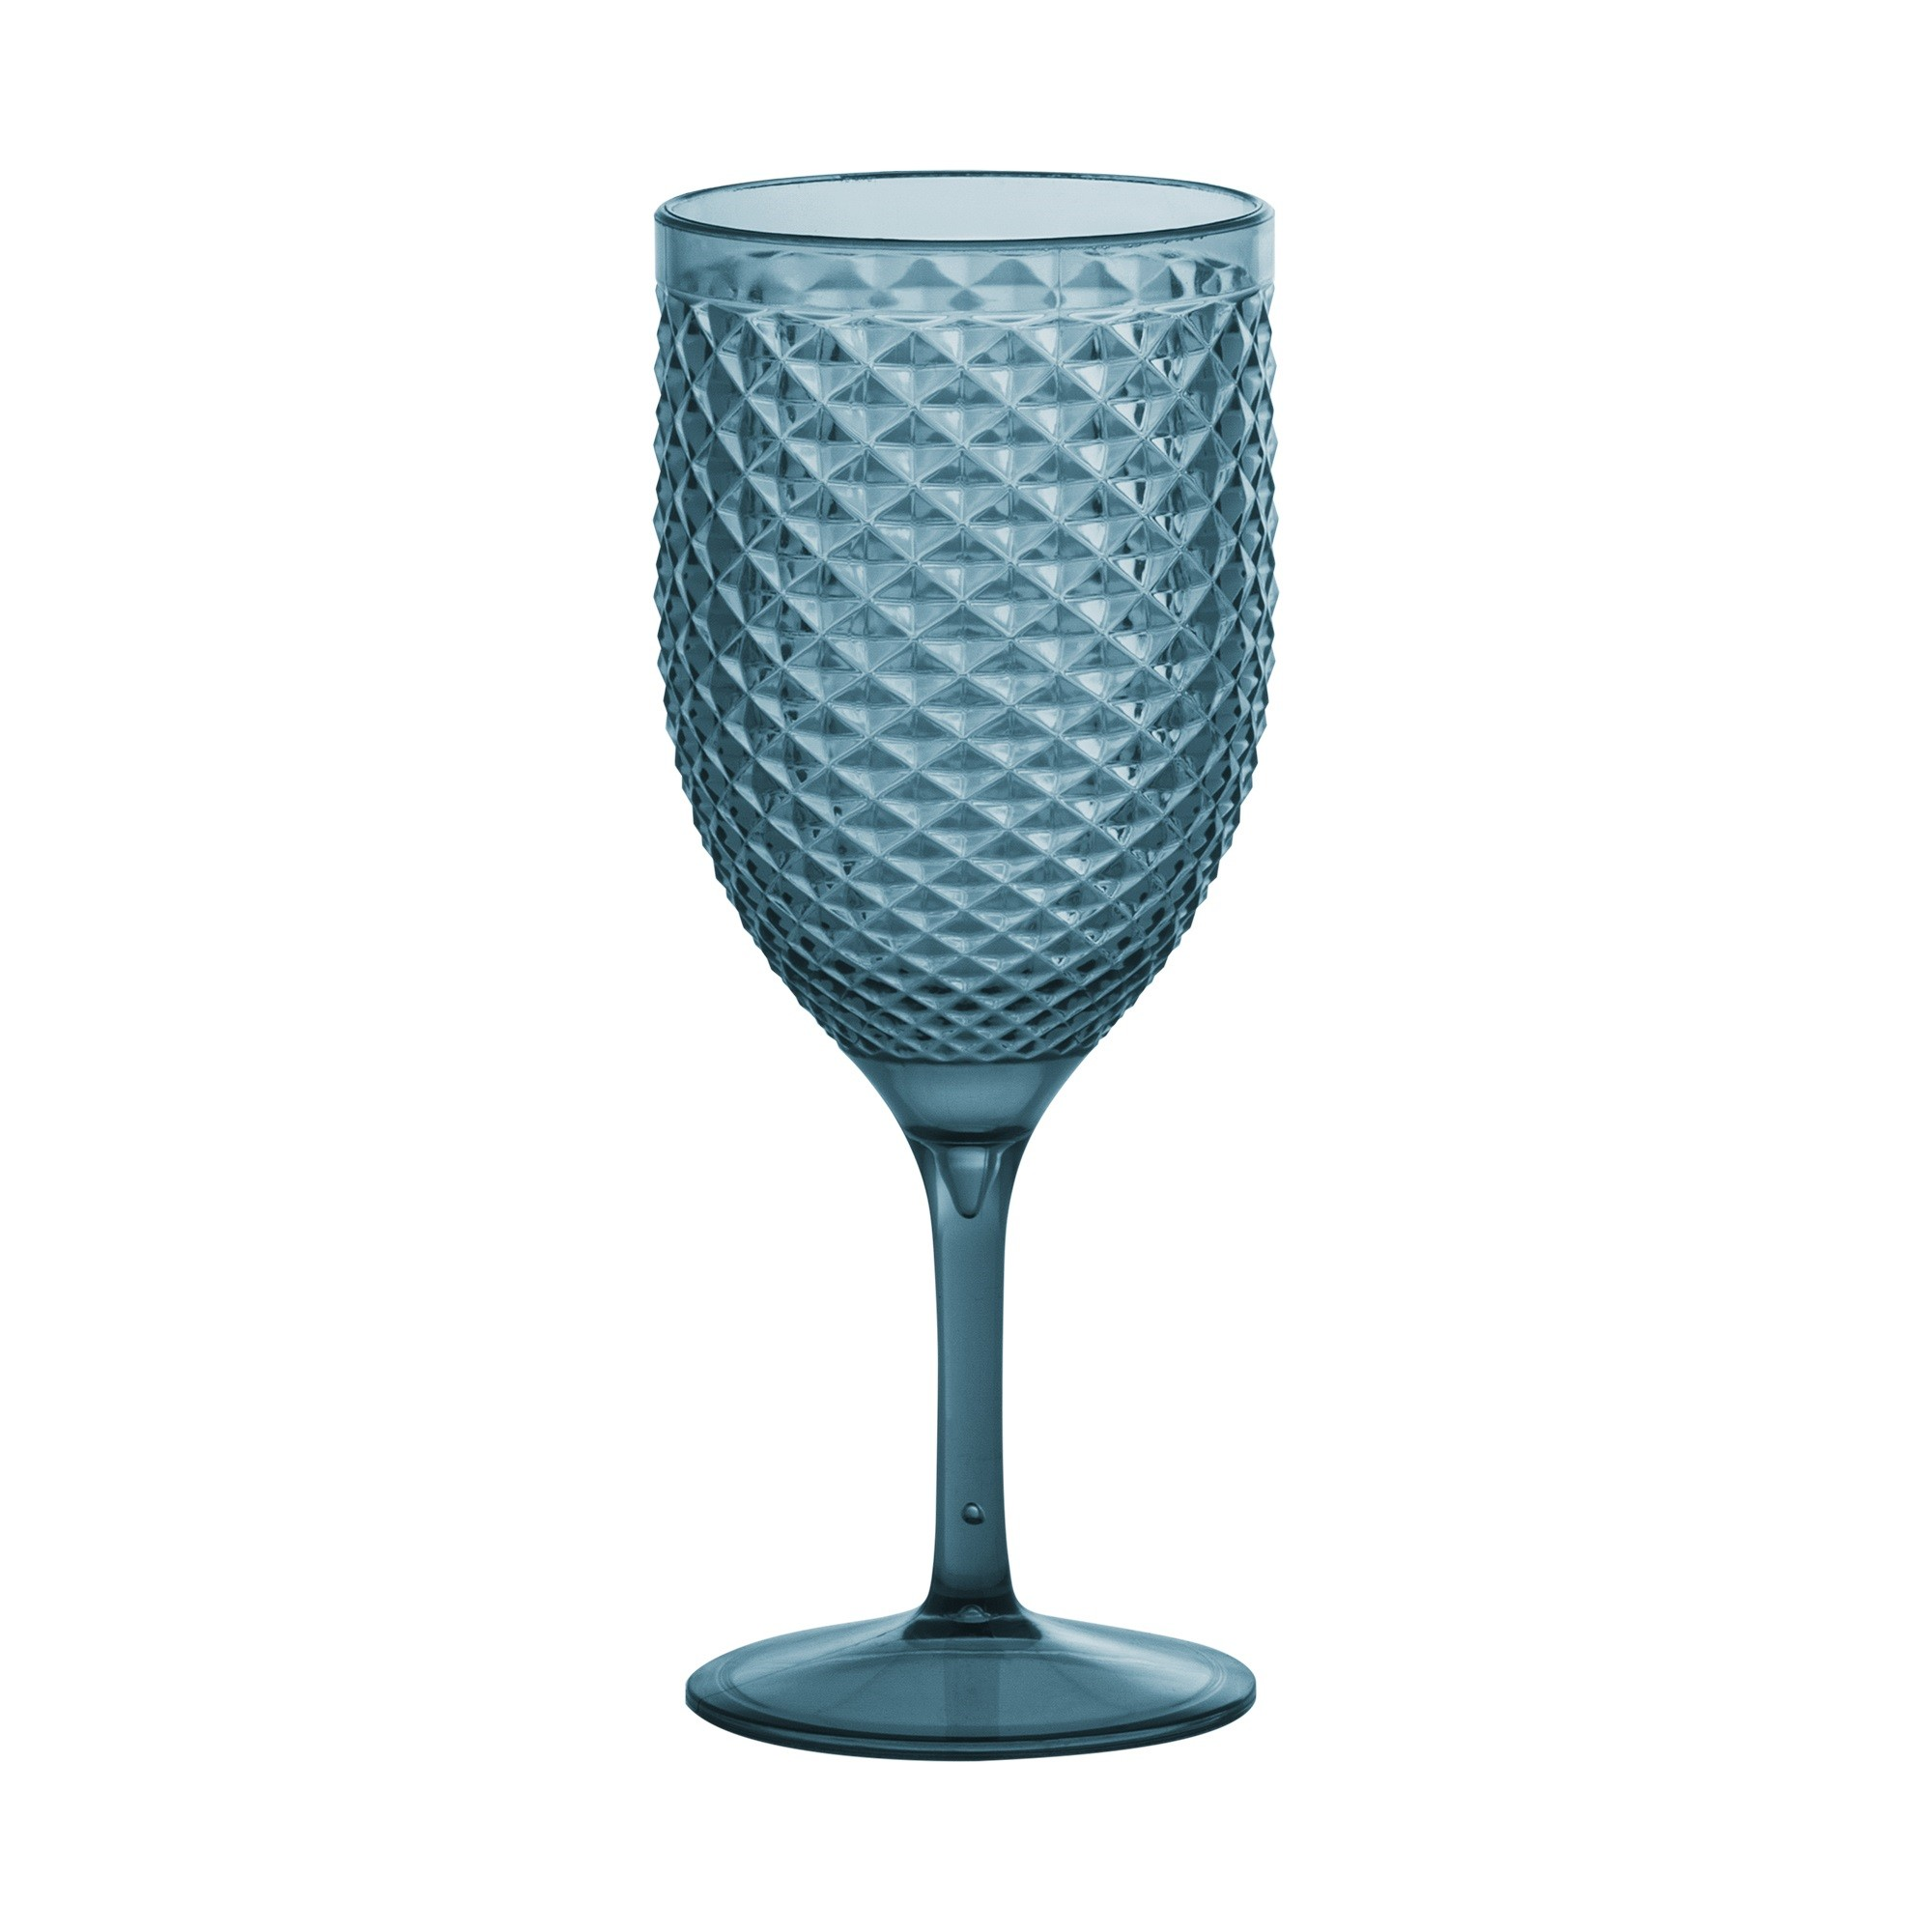 Taca Luxxor de Acrilico para Vinho 480ml Verde - Paramount